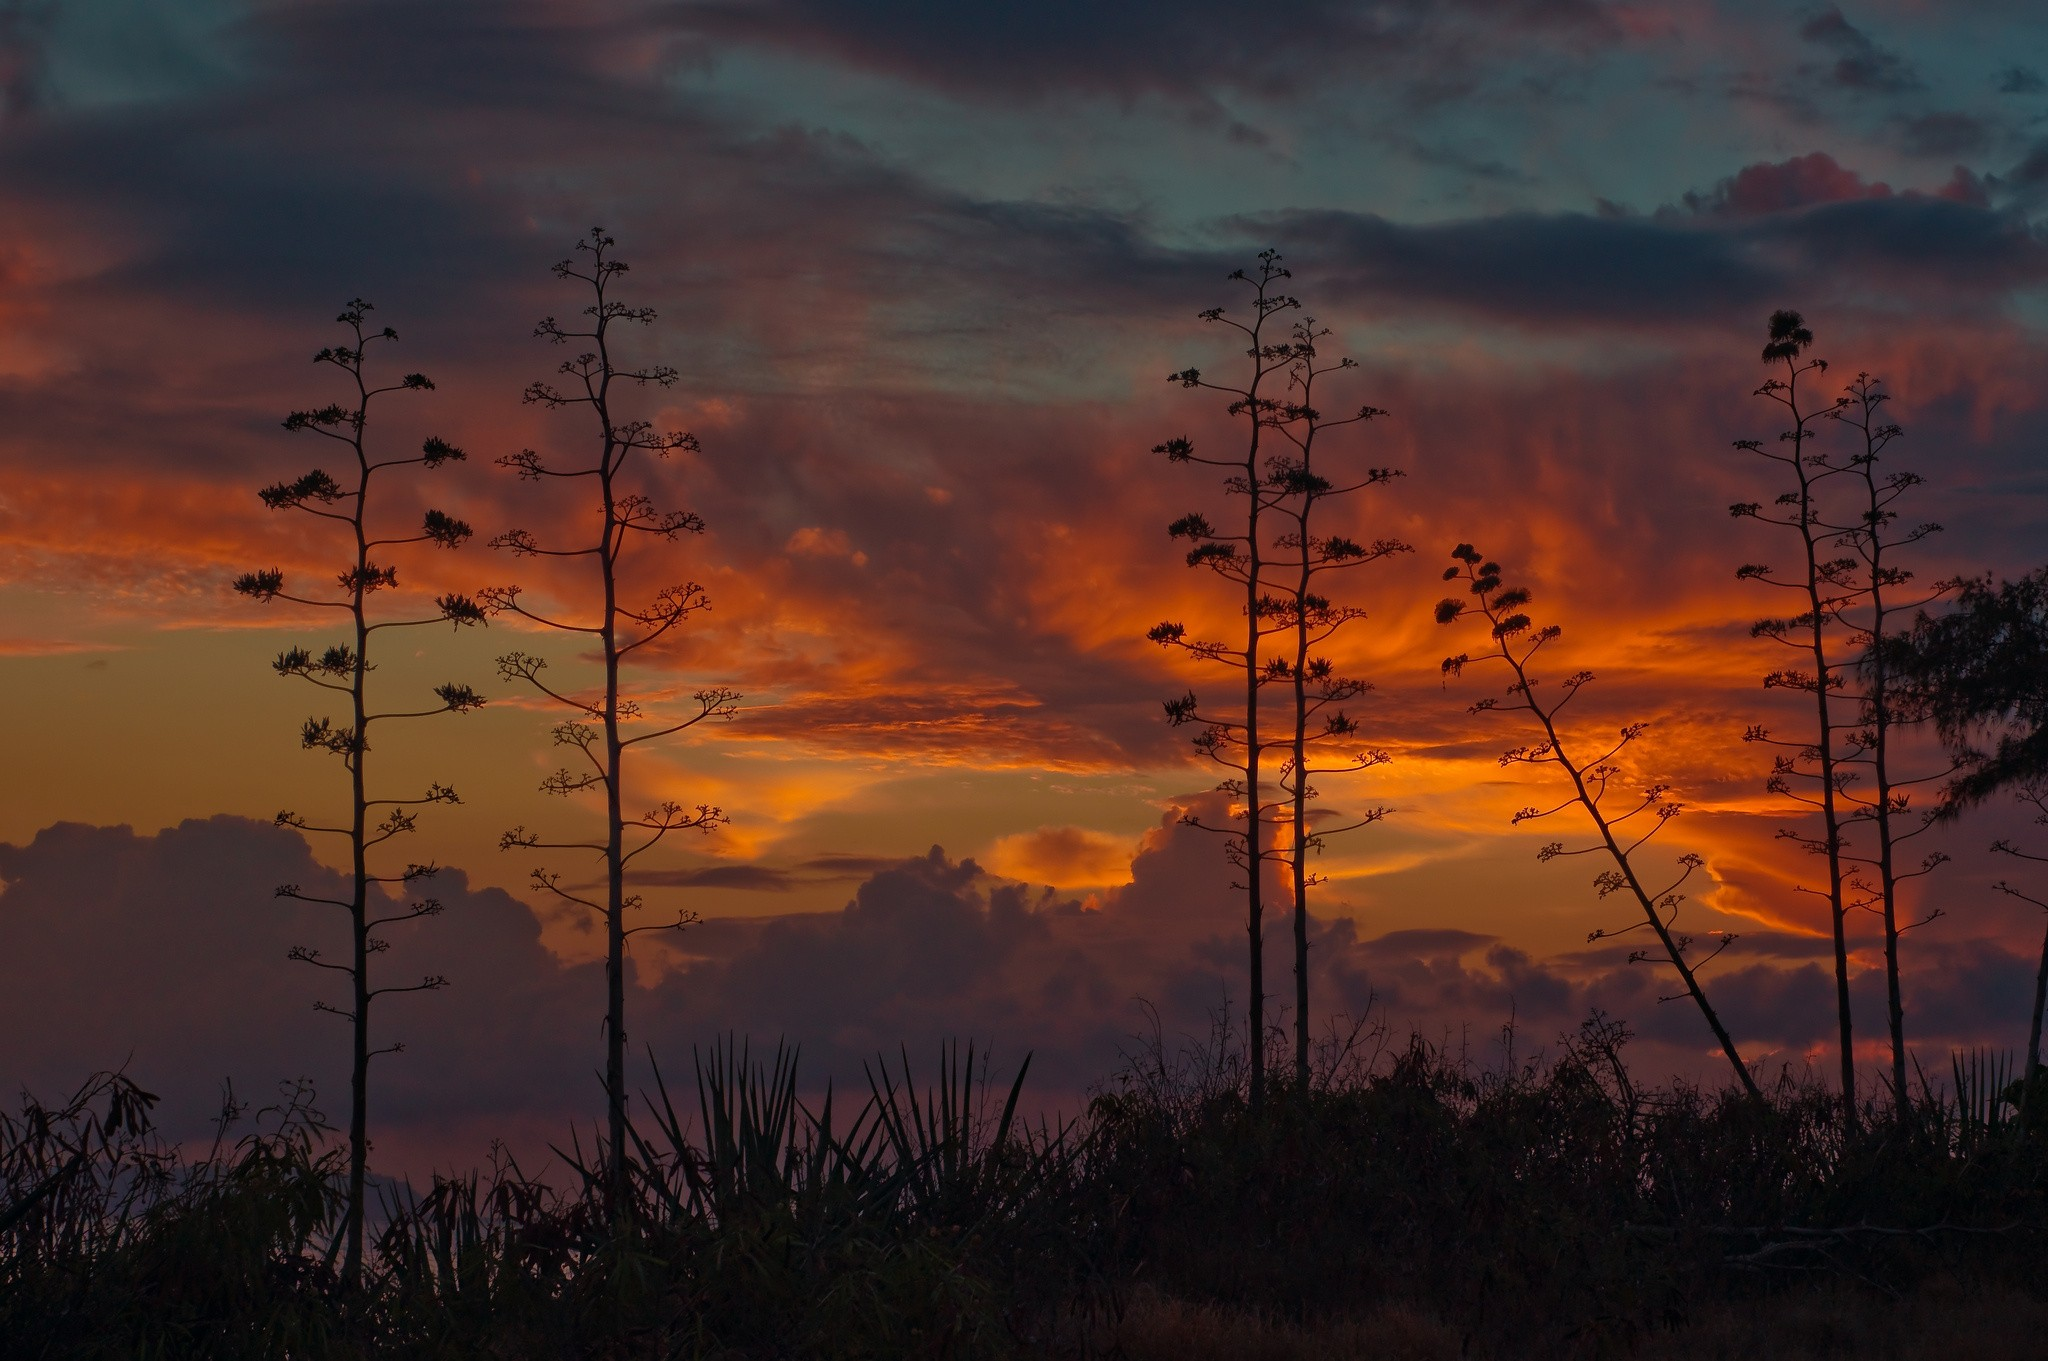 Display River Backgrounds Kauai Backgroundfree Images Sunset 2048x1361